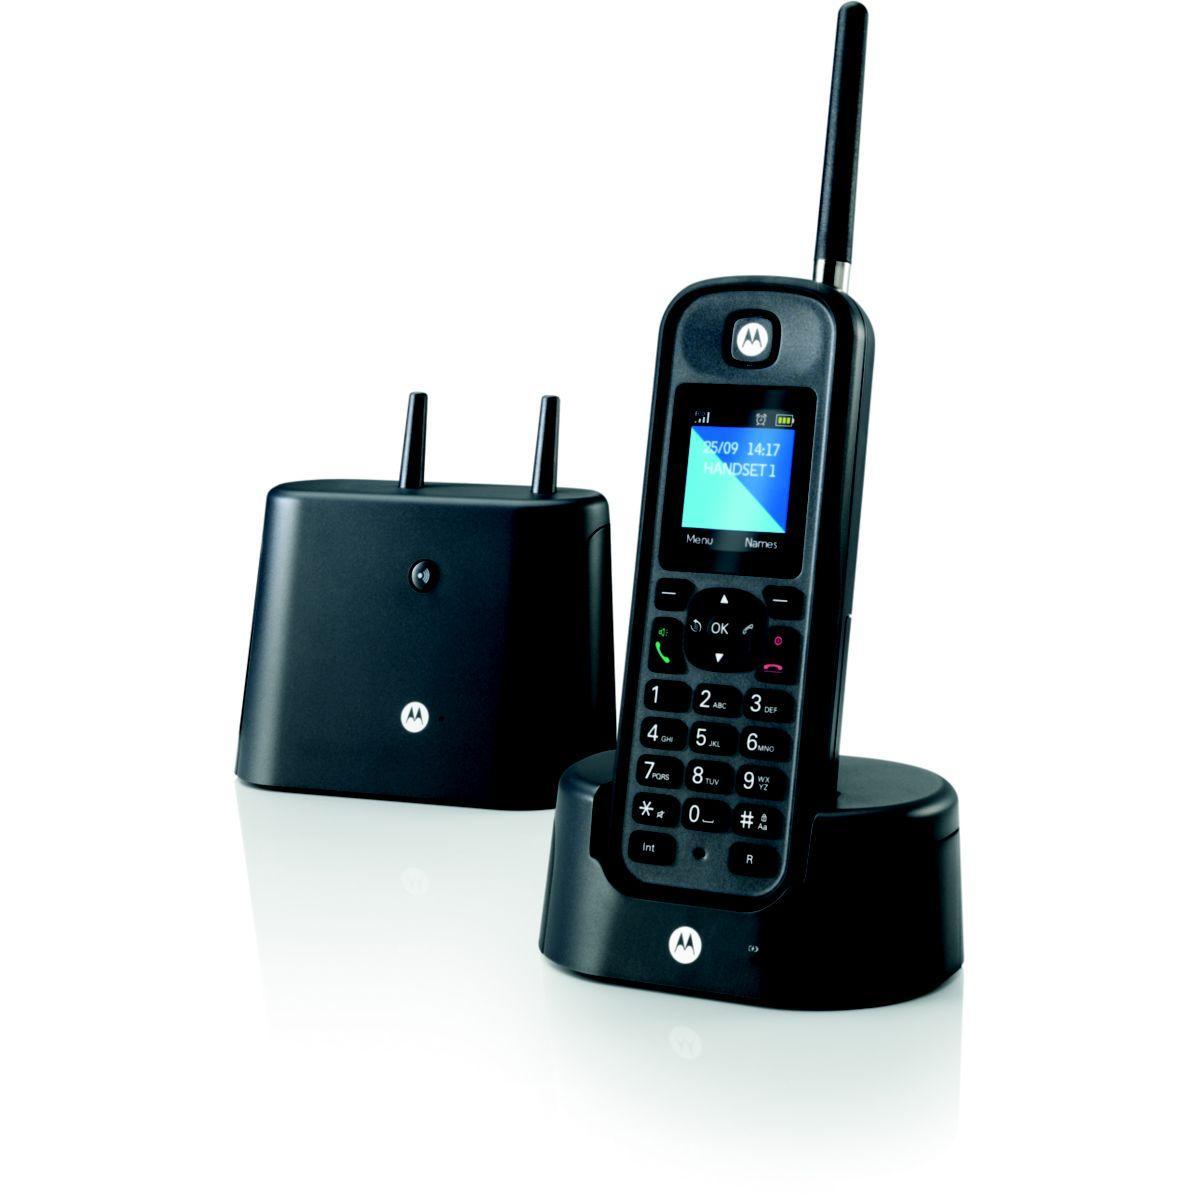 Téléphone motorola motorola o201 noir - 20% de remise immédiate avec le code : multi20 (photo)